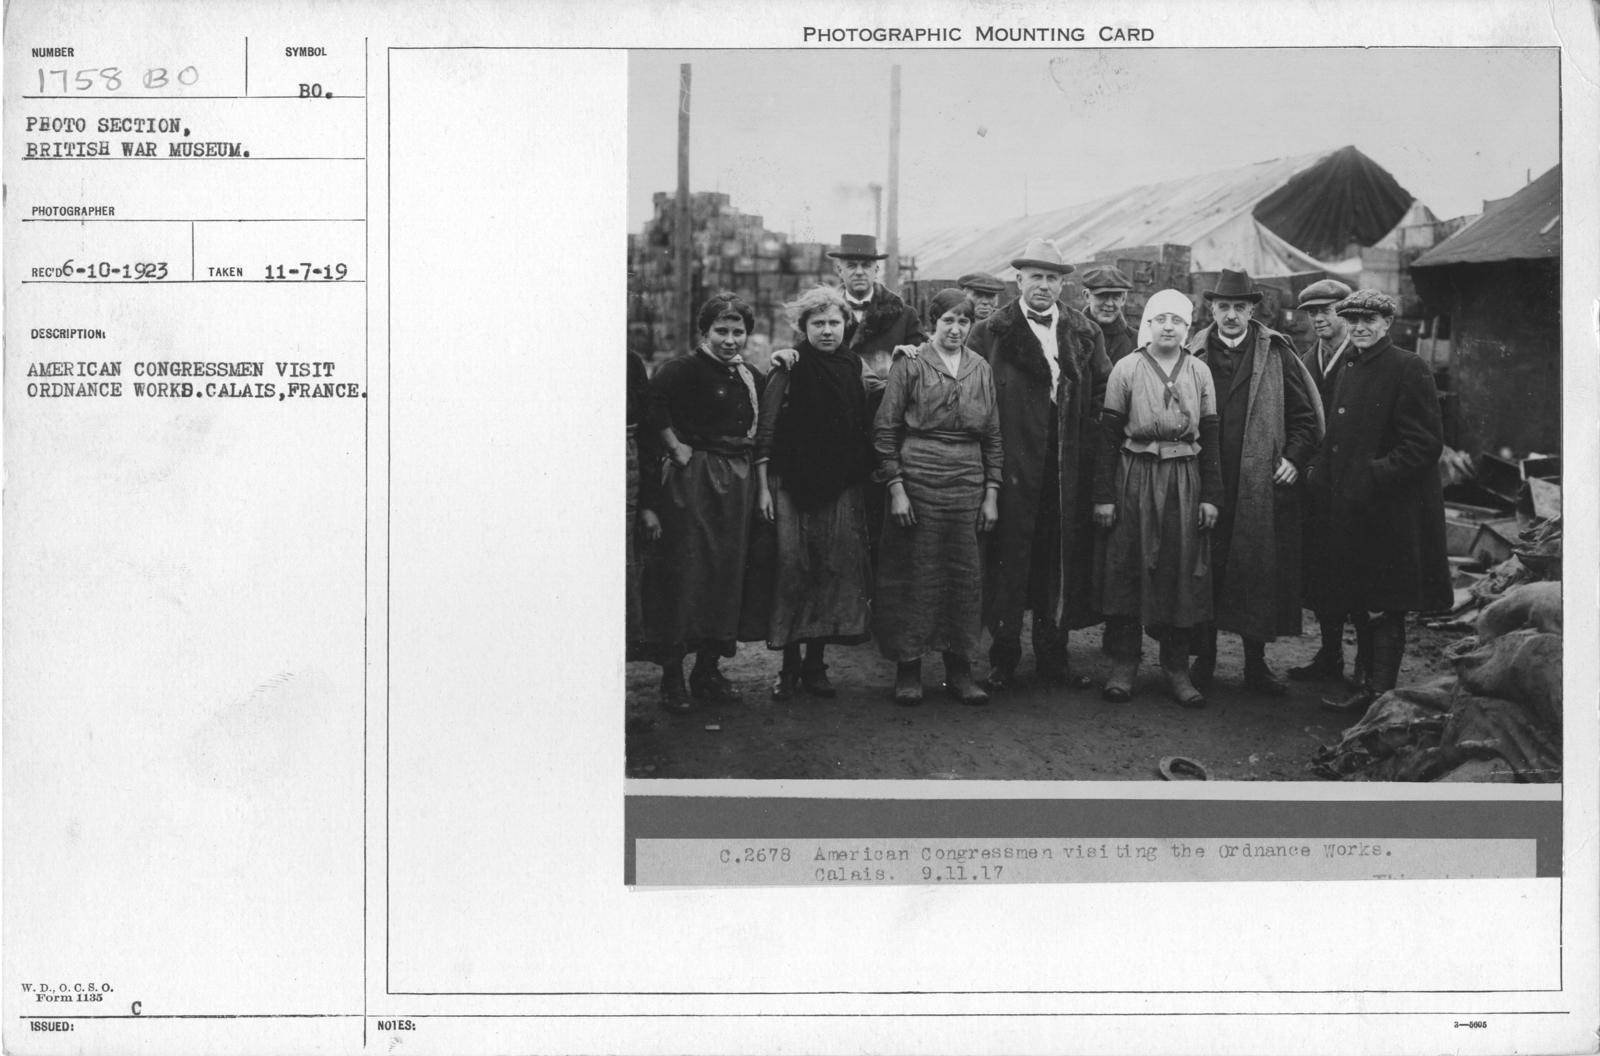 American congressman visit ordnance works. Calais, France